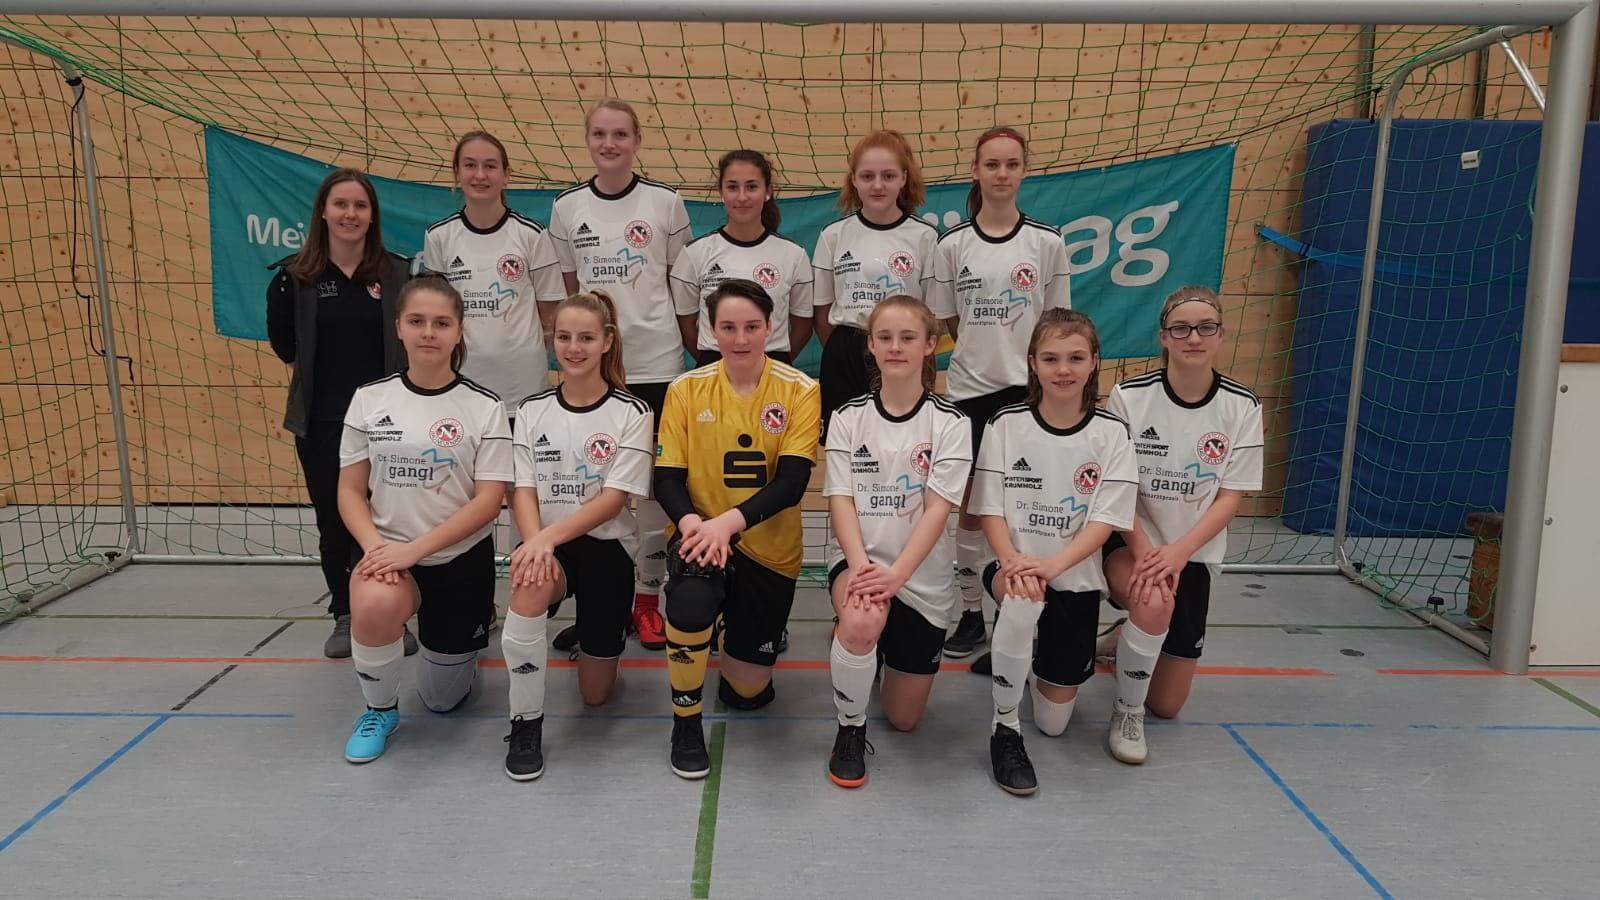 C-Junioren - SC Bad Neuenahr - Süwag Hallencup 2020